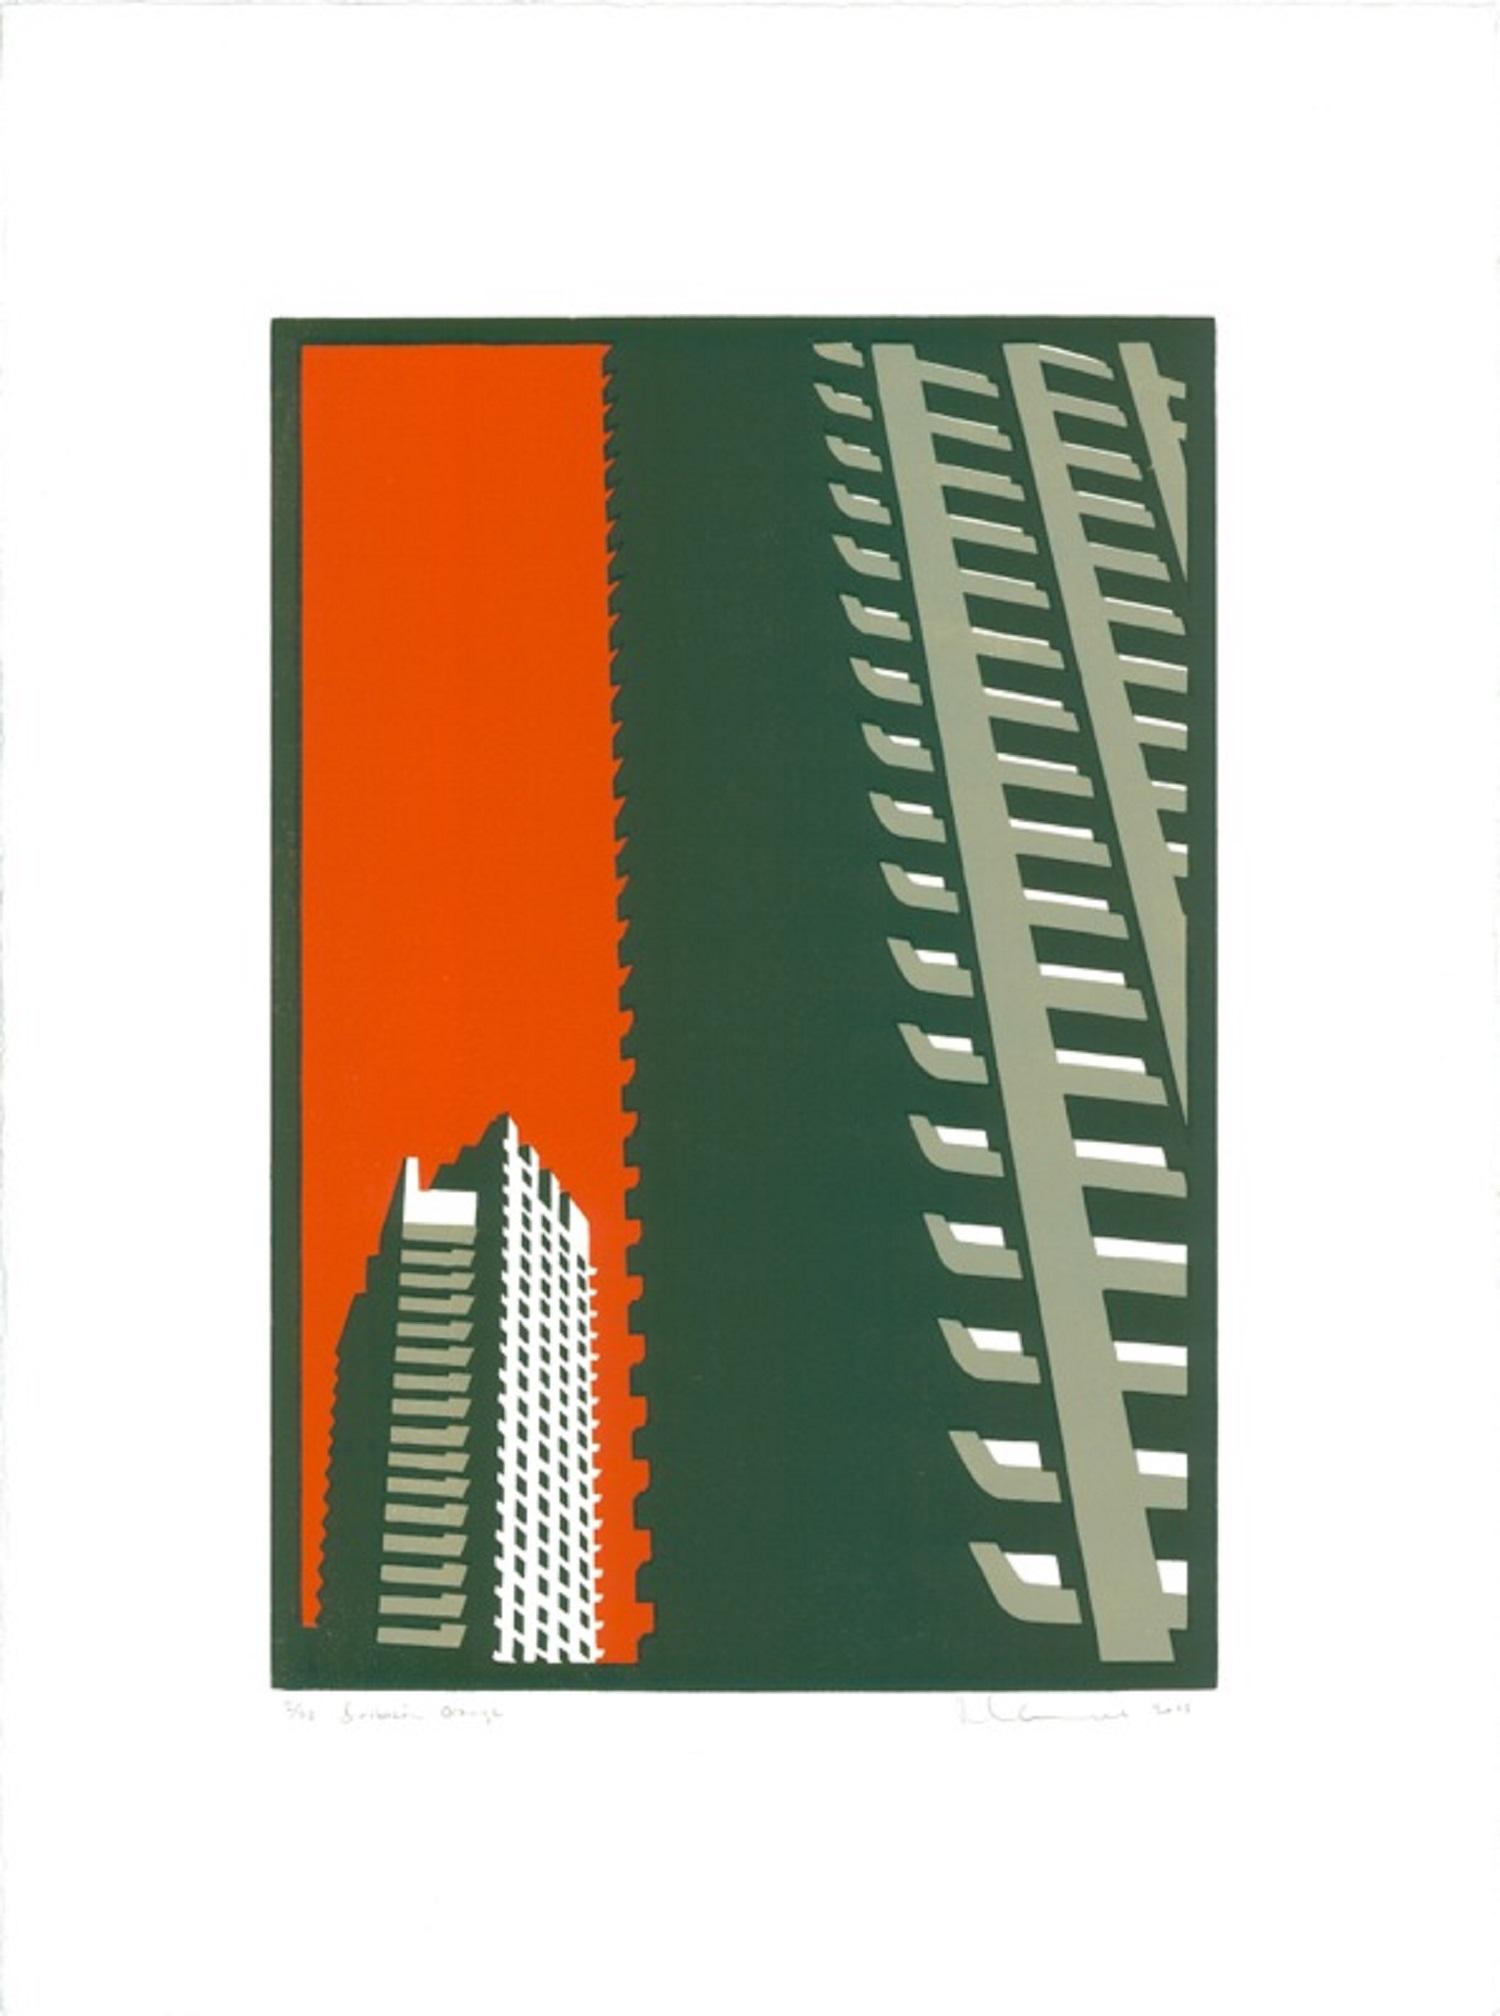 Barbican Orange   linocut   52 x 35 cm  £595 (unframed)